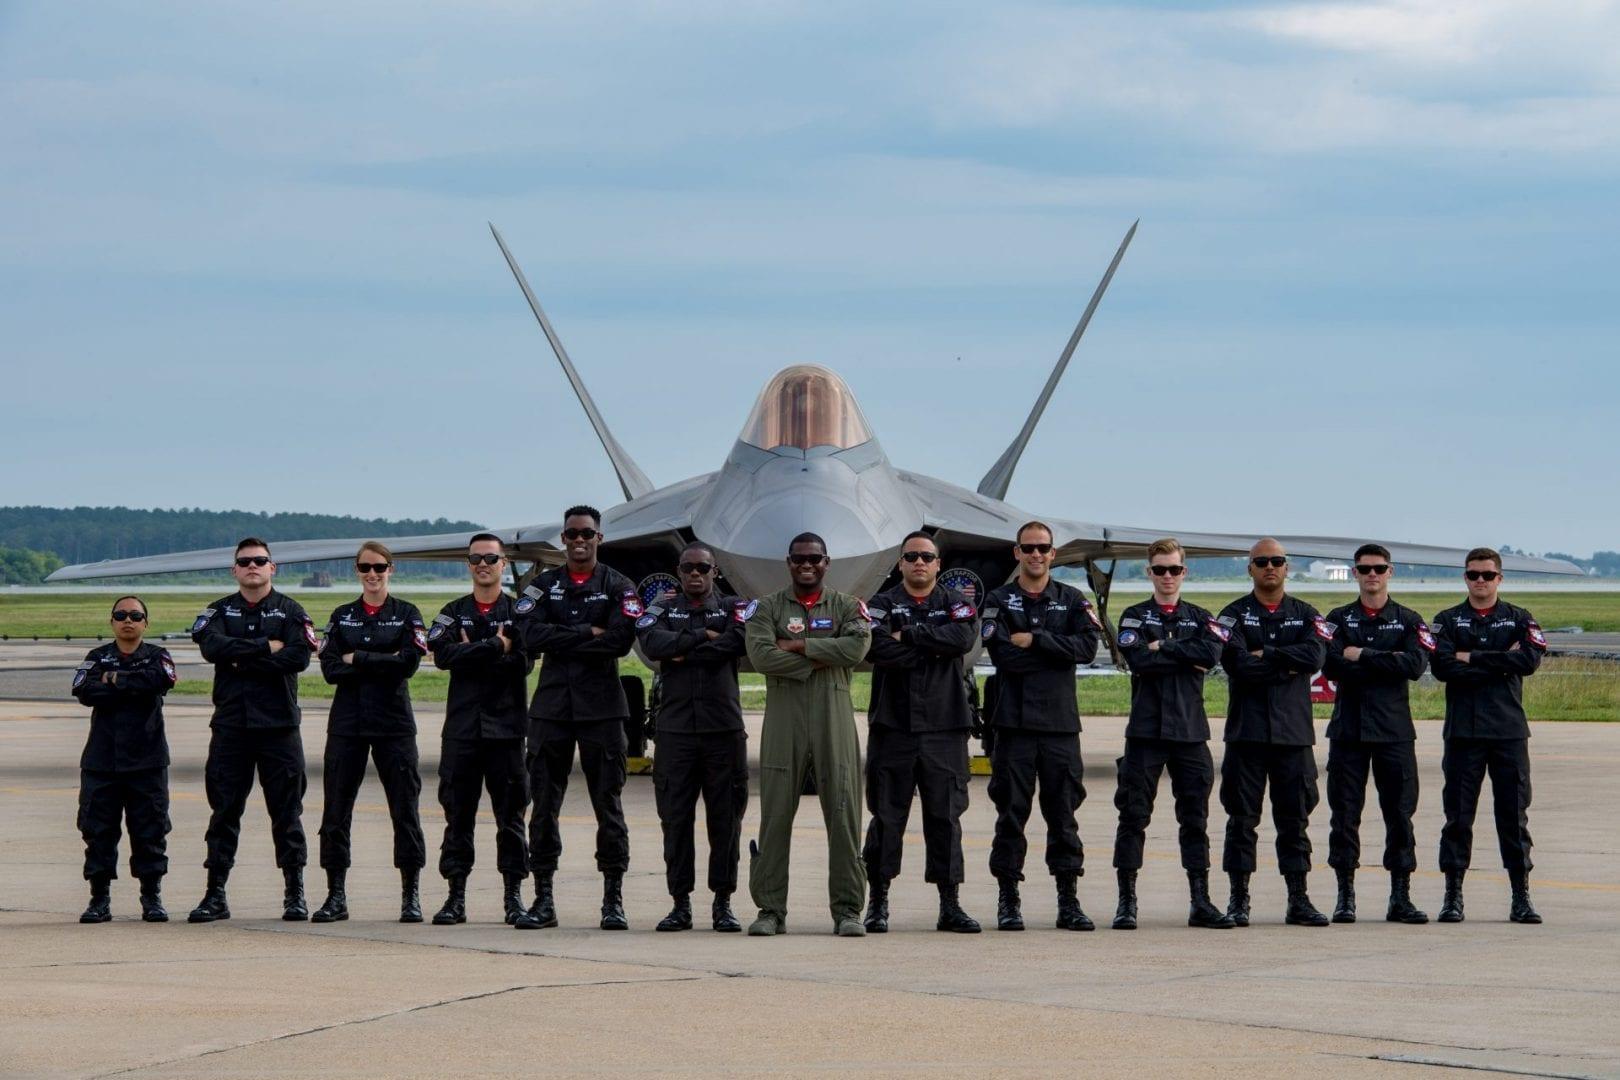 Full F-22 Demo